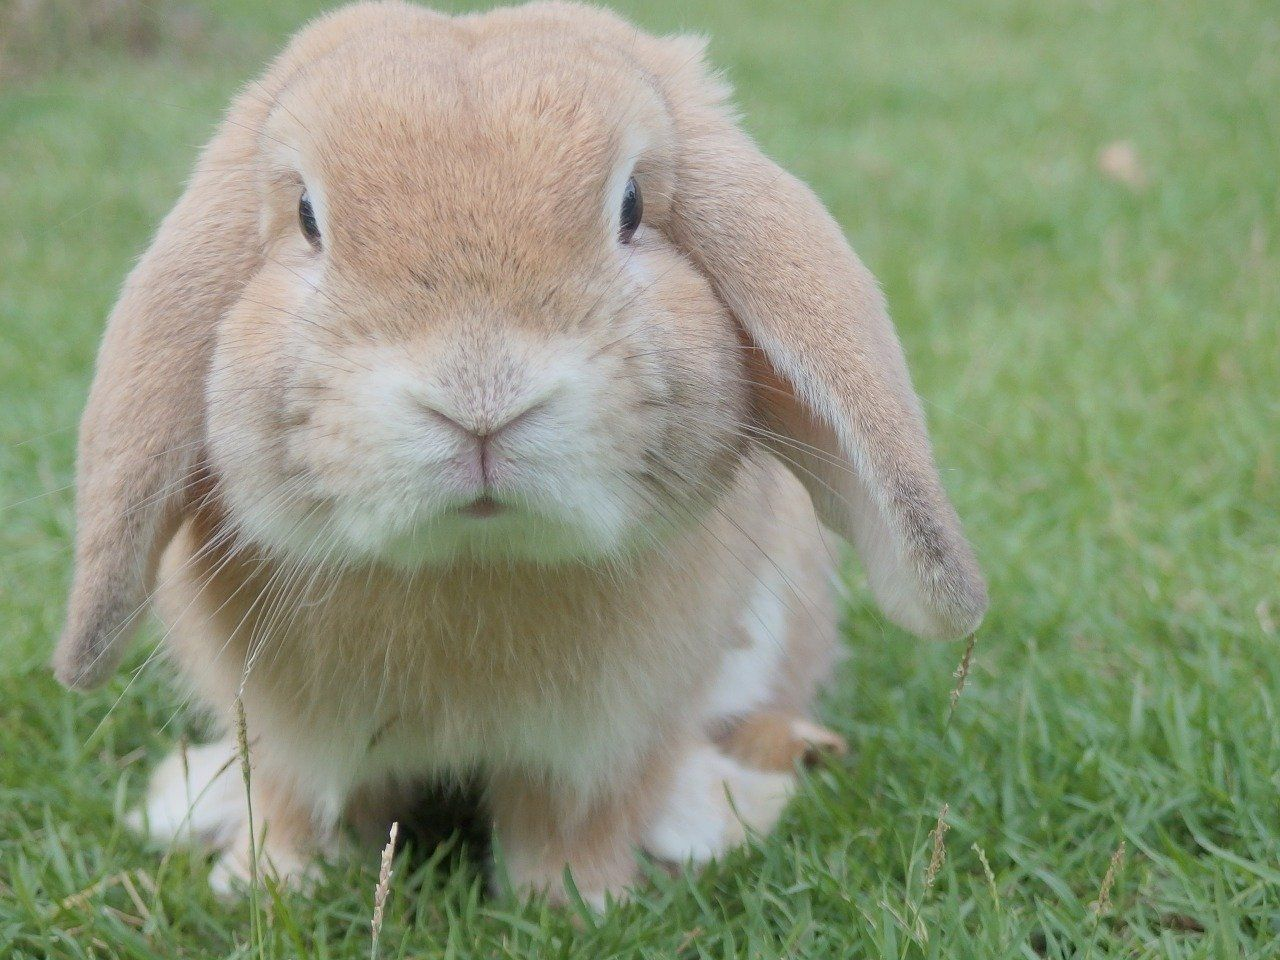 Süßes Kaninchen